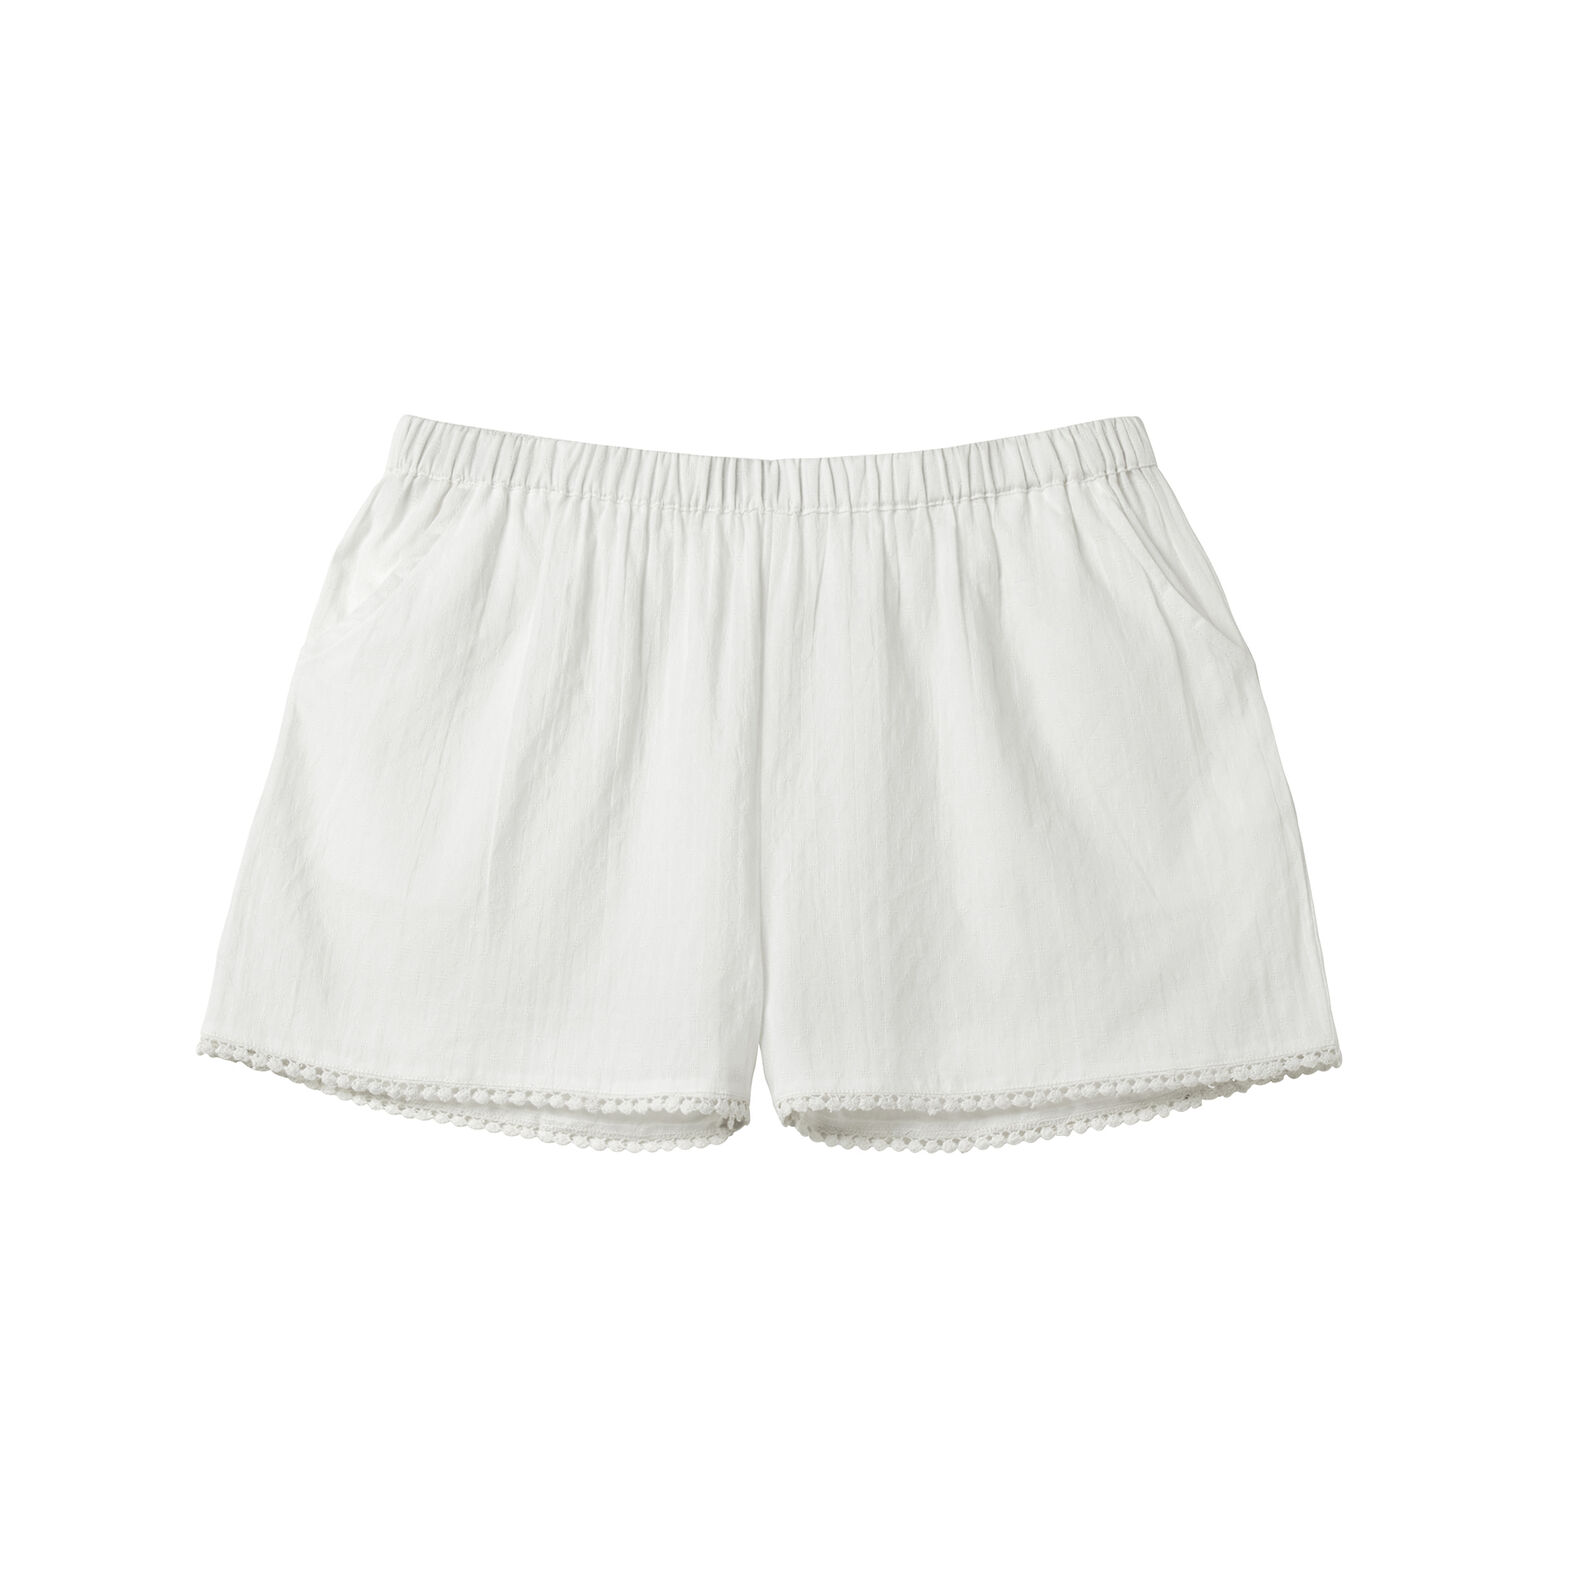 Ultra-lightweight shorts in 100% cotton.